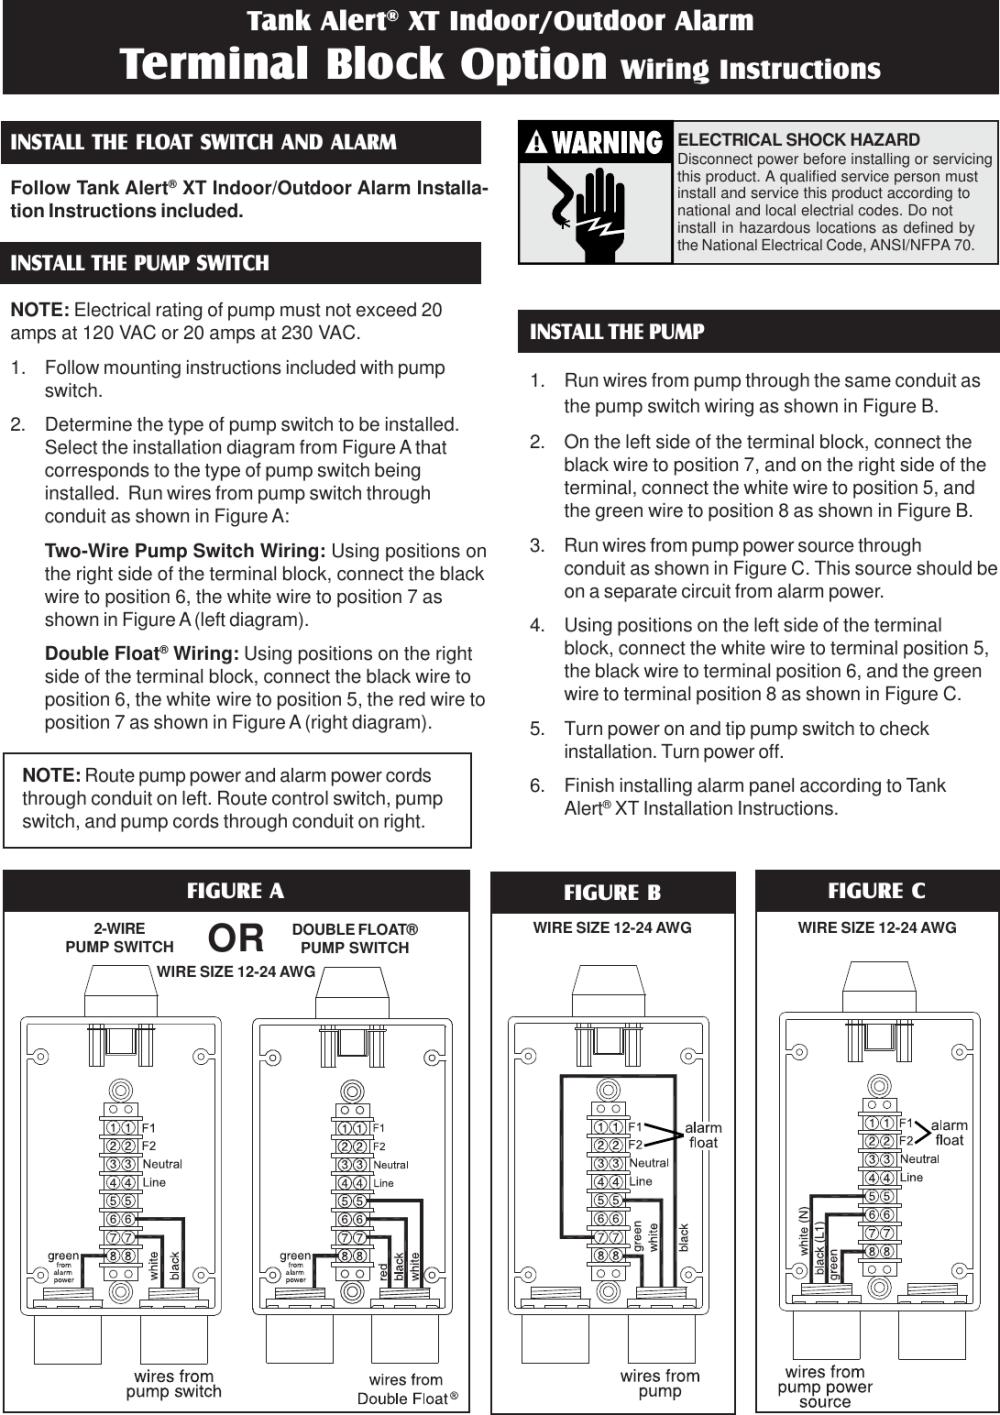 medium resolution of tank alert xt source 1011020g tb wiring instr pmd 550334 4 sje rhombus